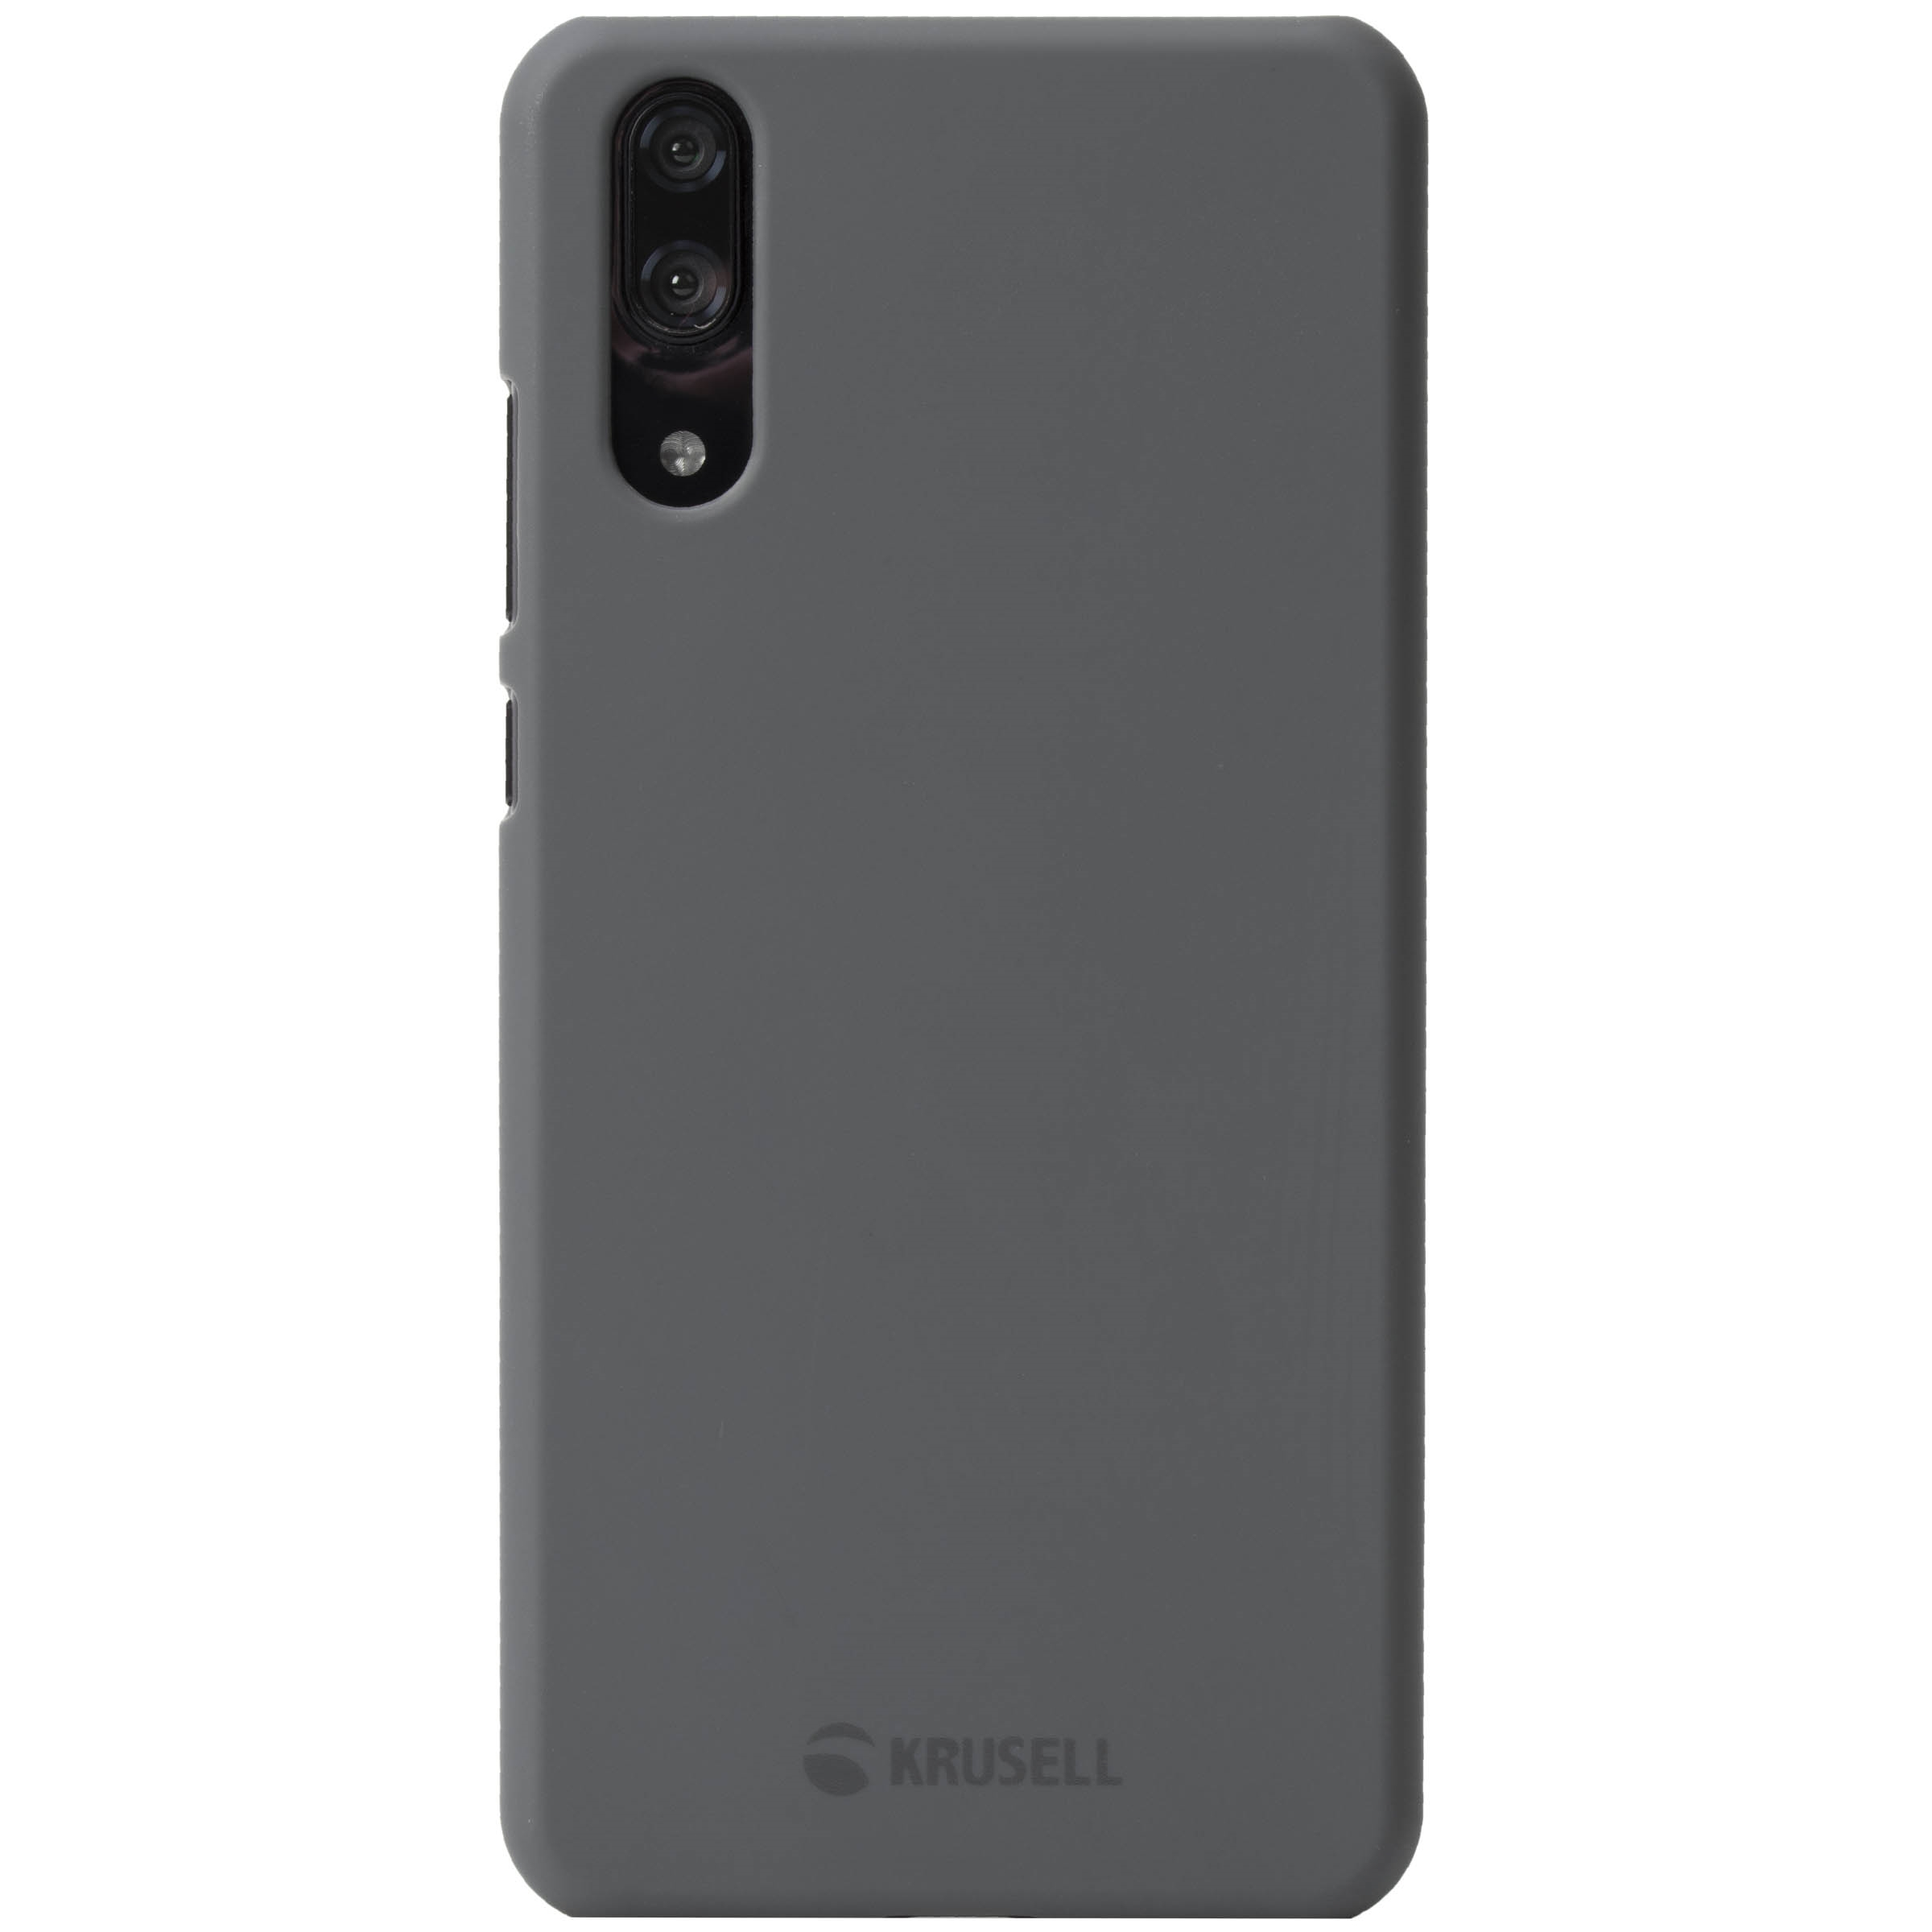 Capac protectie spate Krusell Nora Cover pentru Huawei P20 Gri